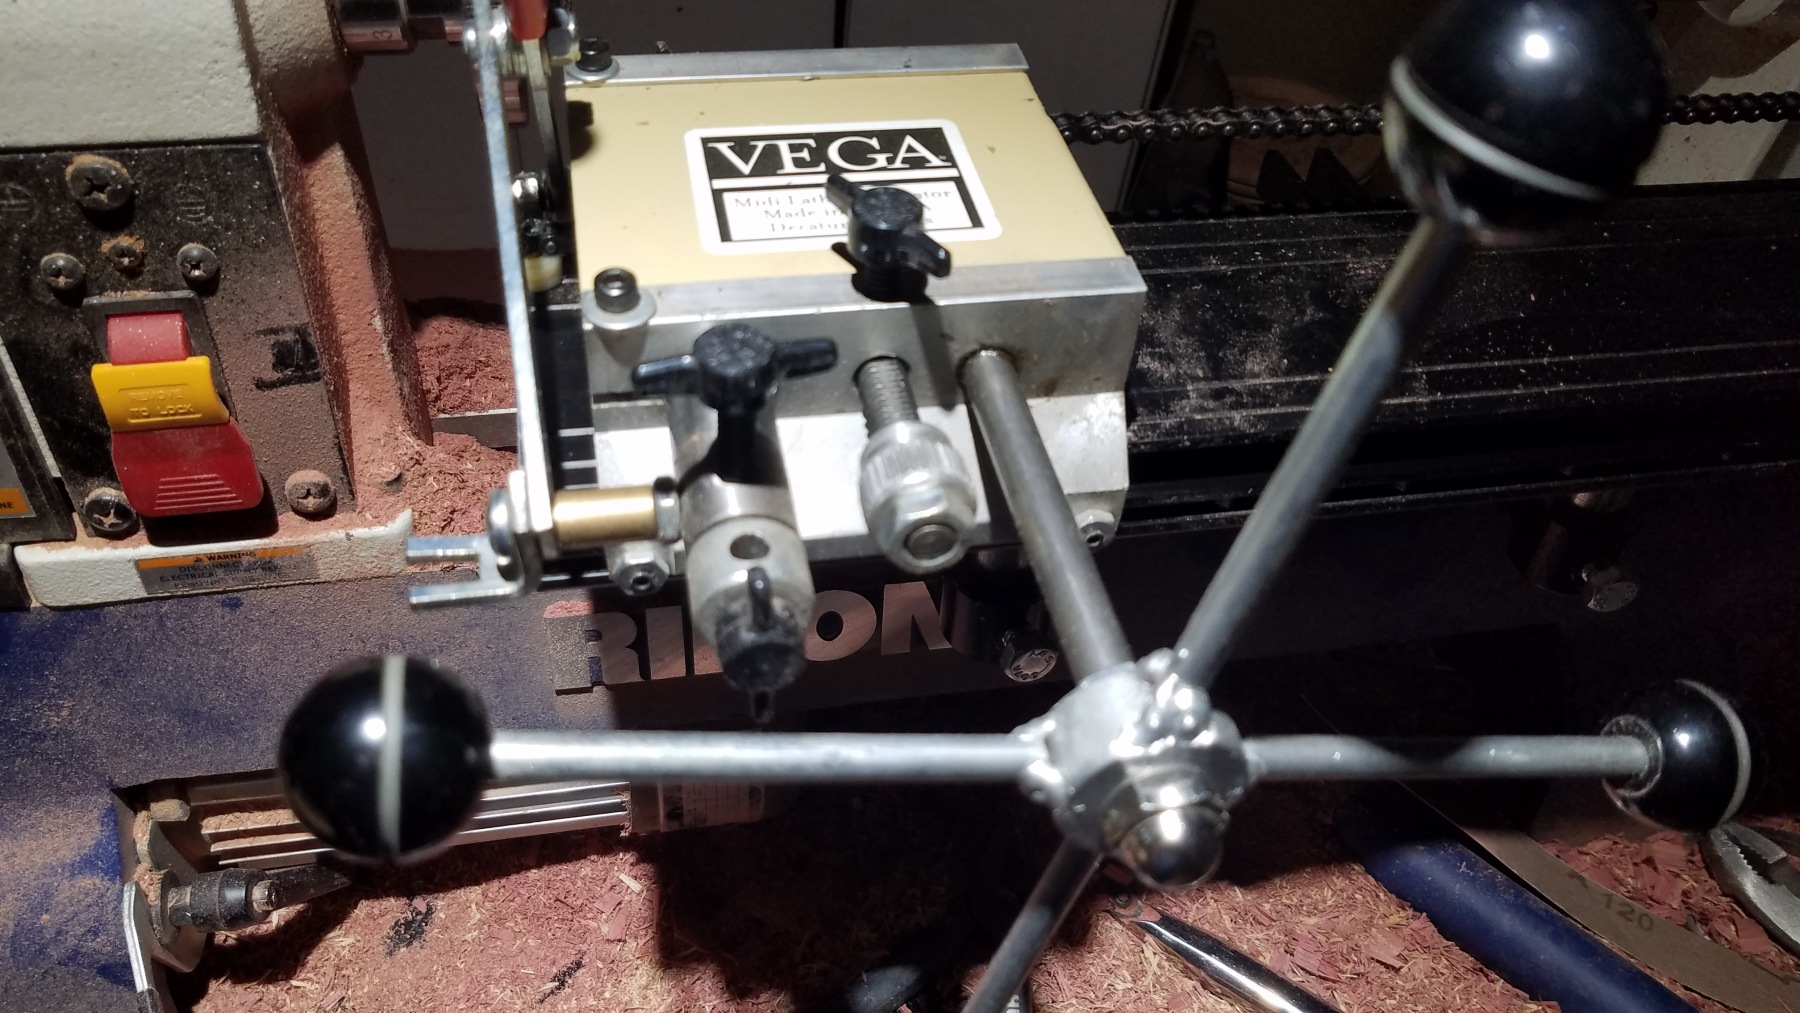 Vega Midi Lathe Duplicator Manual